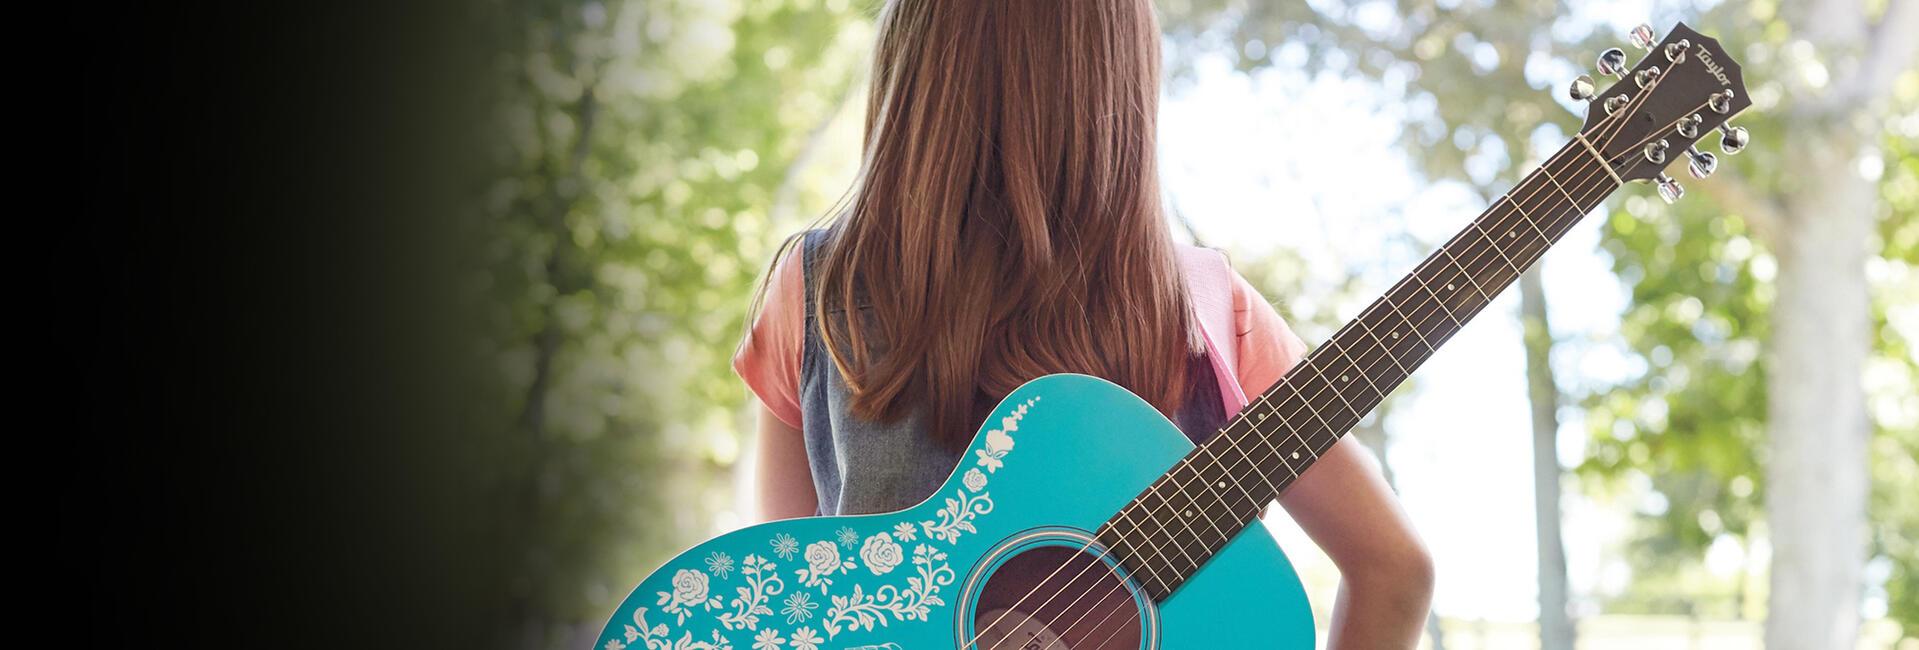 American Girl Gs Mini Taylor Guitars